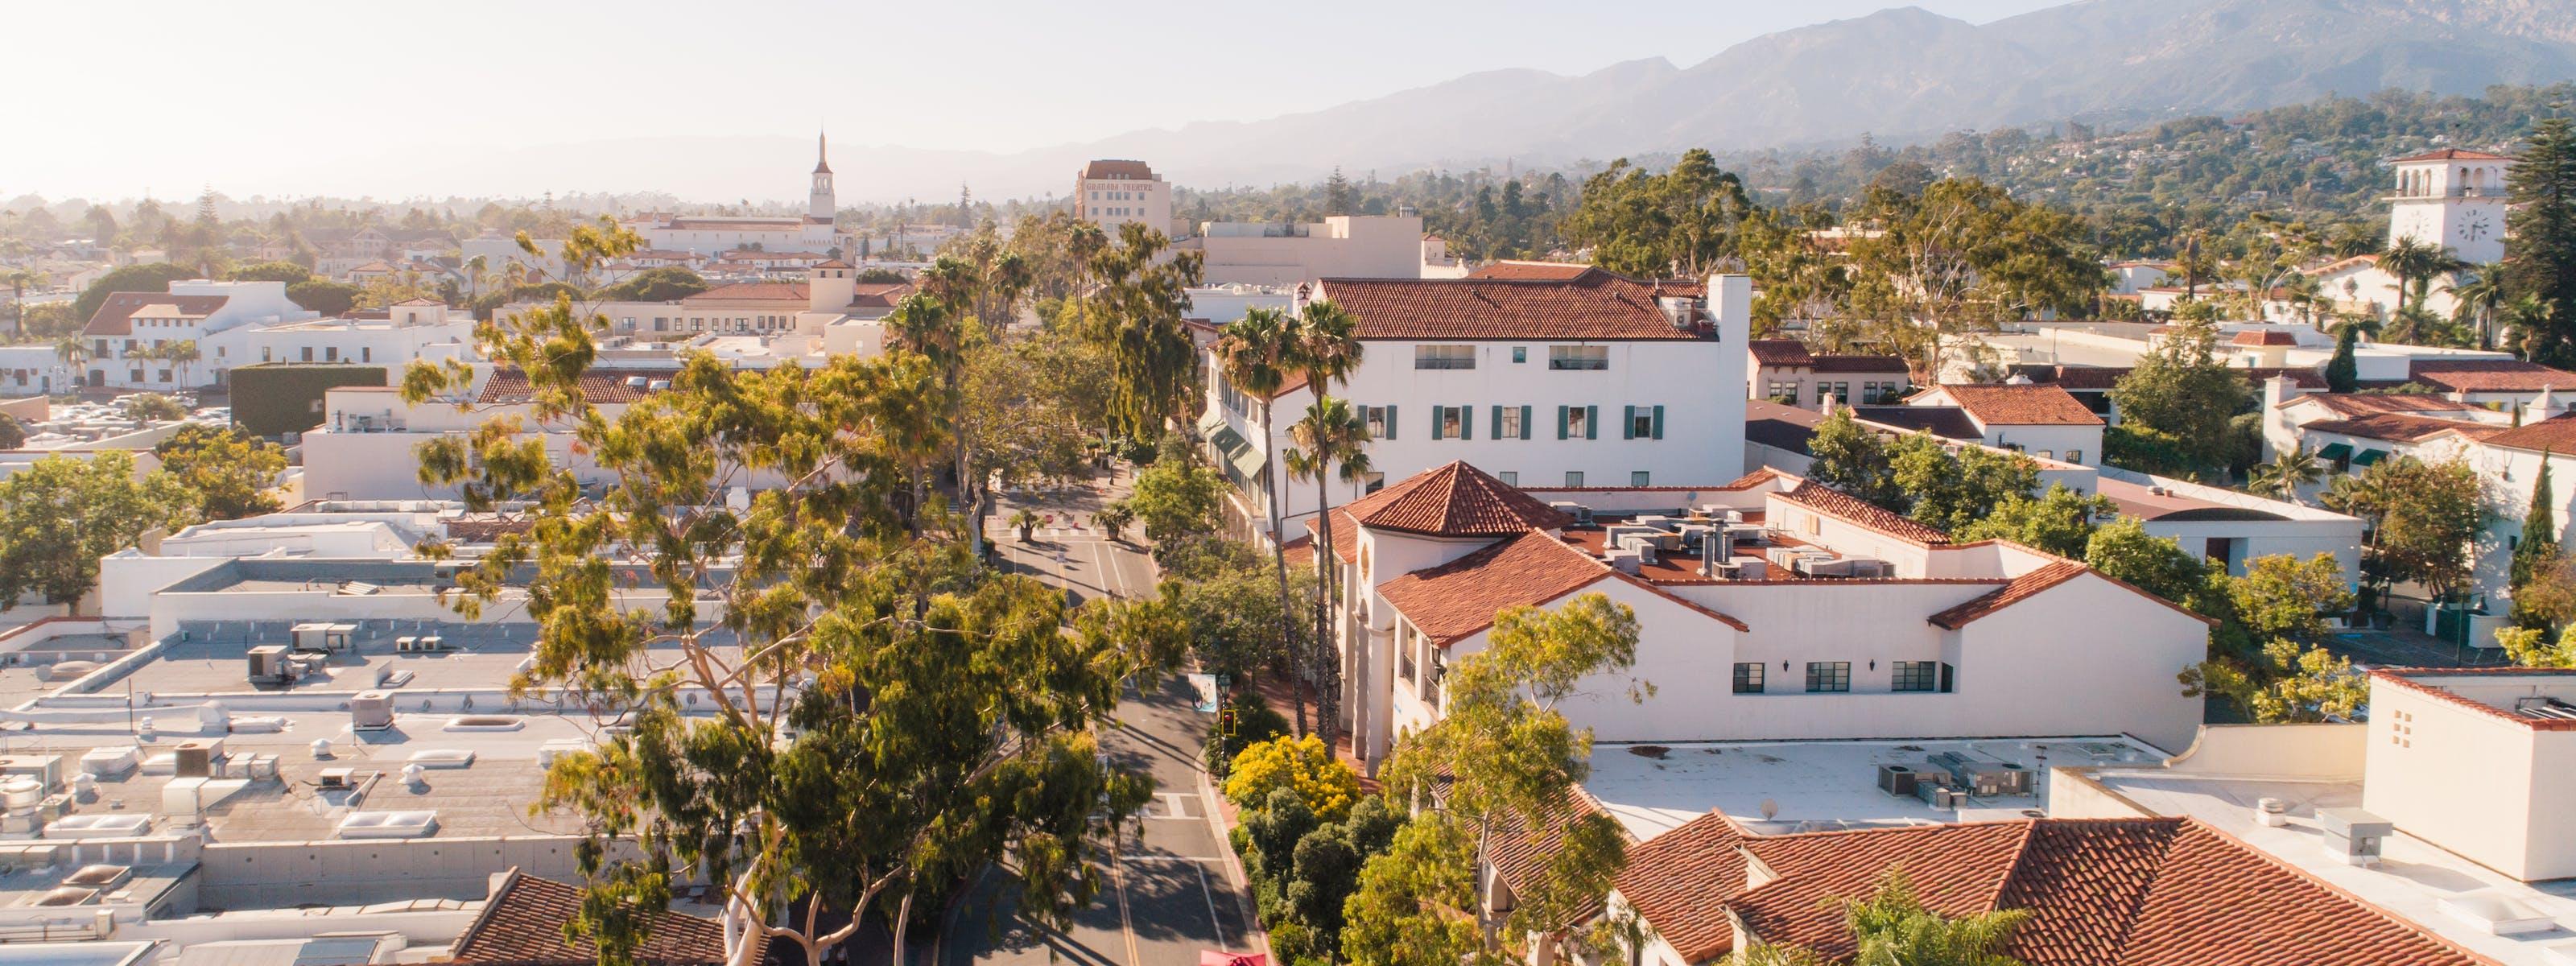 Where To Eat Outside In Santa Barbara - Santa Barbara - Los Angeles - The Infatuation